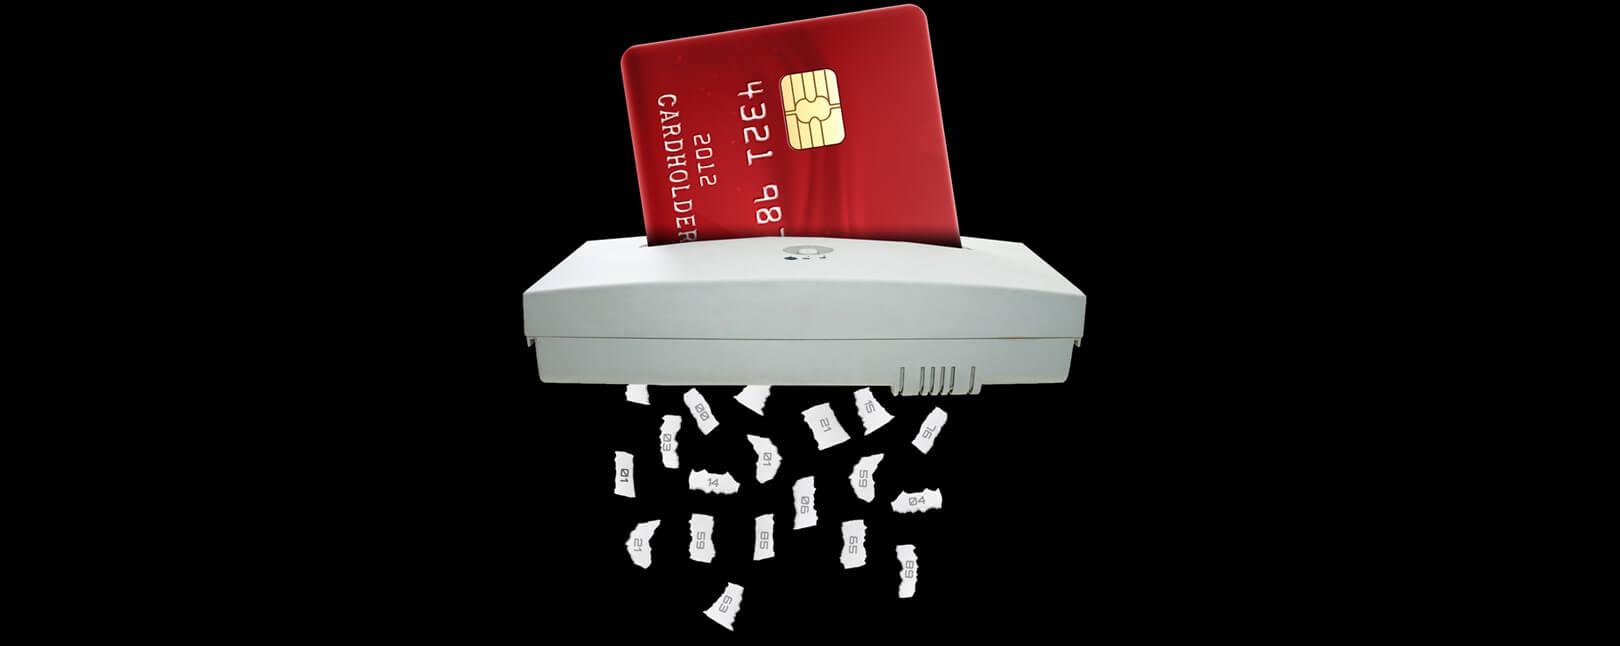 Credit Card Decline Codes Shredder Card